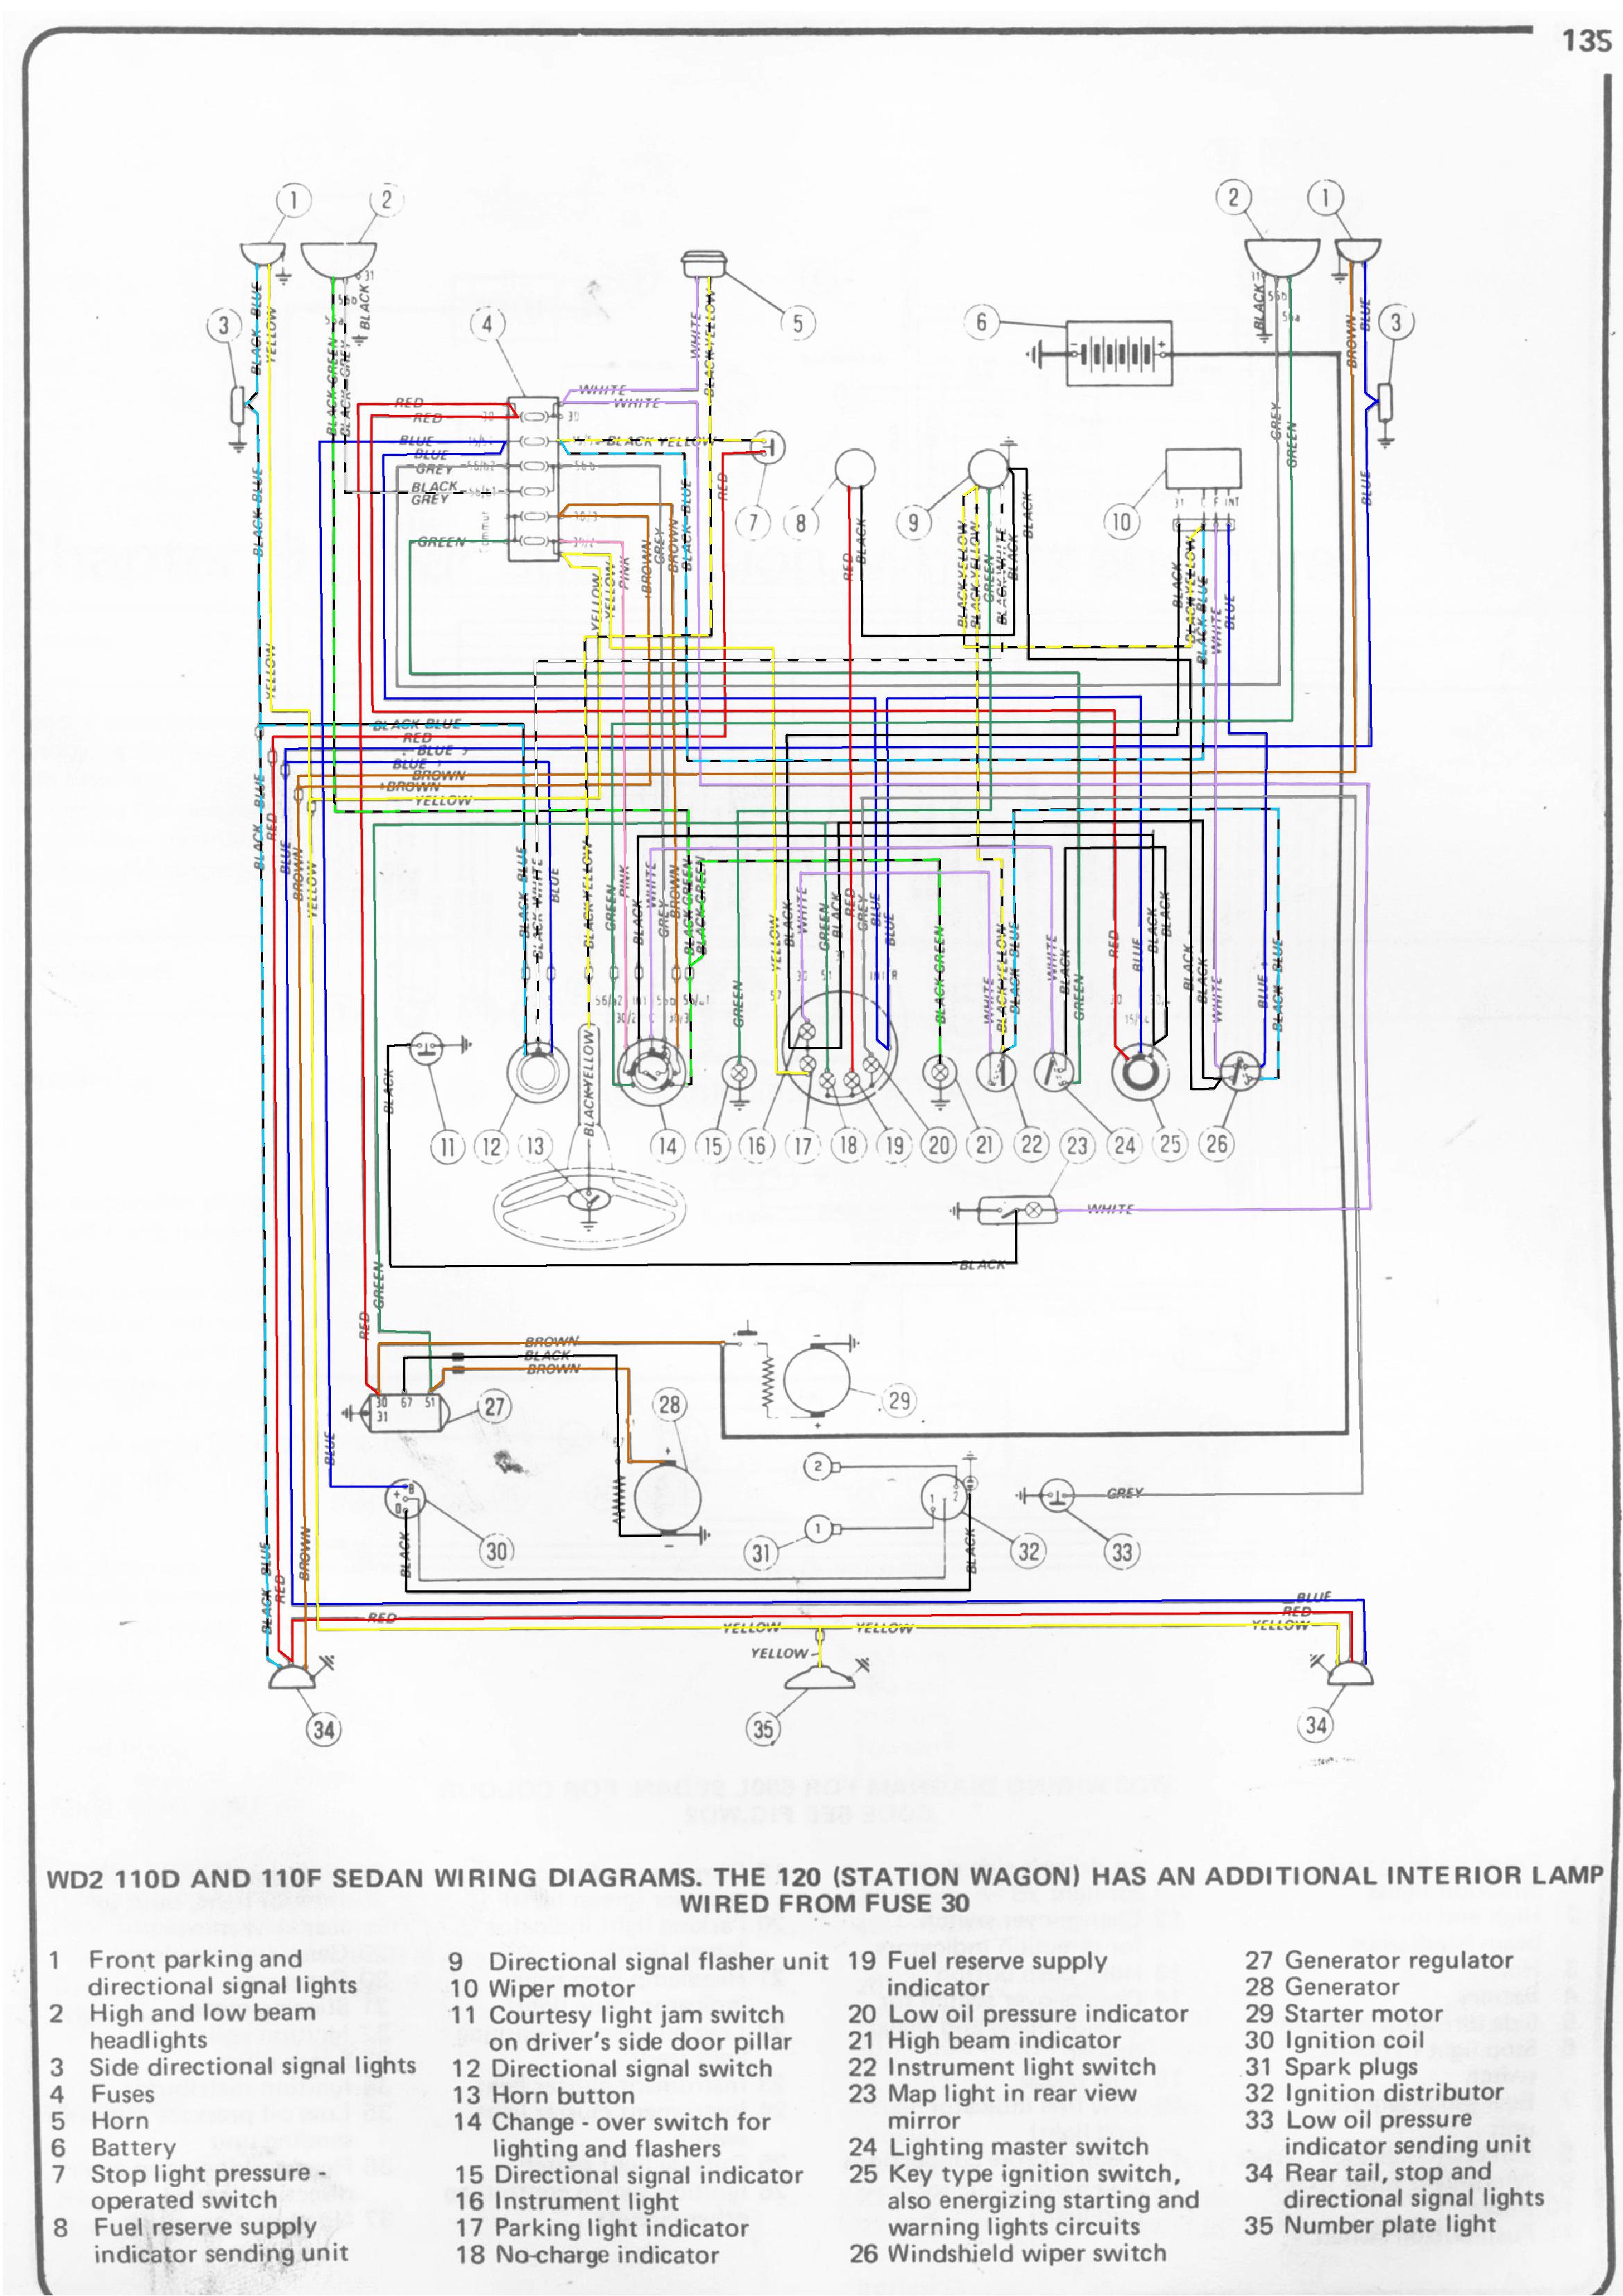 Fiat Wiring Diagram Schematic 2019 1983 124 Electrical Another Blog About U2022 Rh Ok2 Infoservice Ru Punto Panda